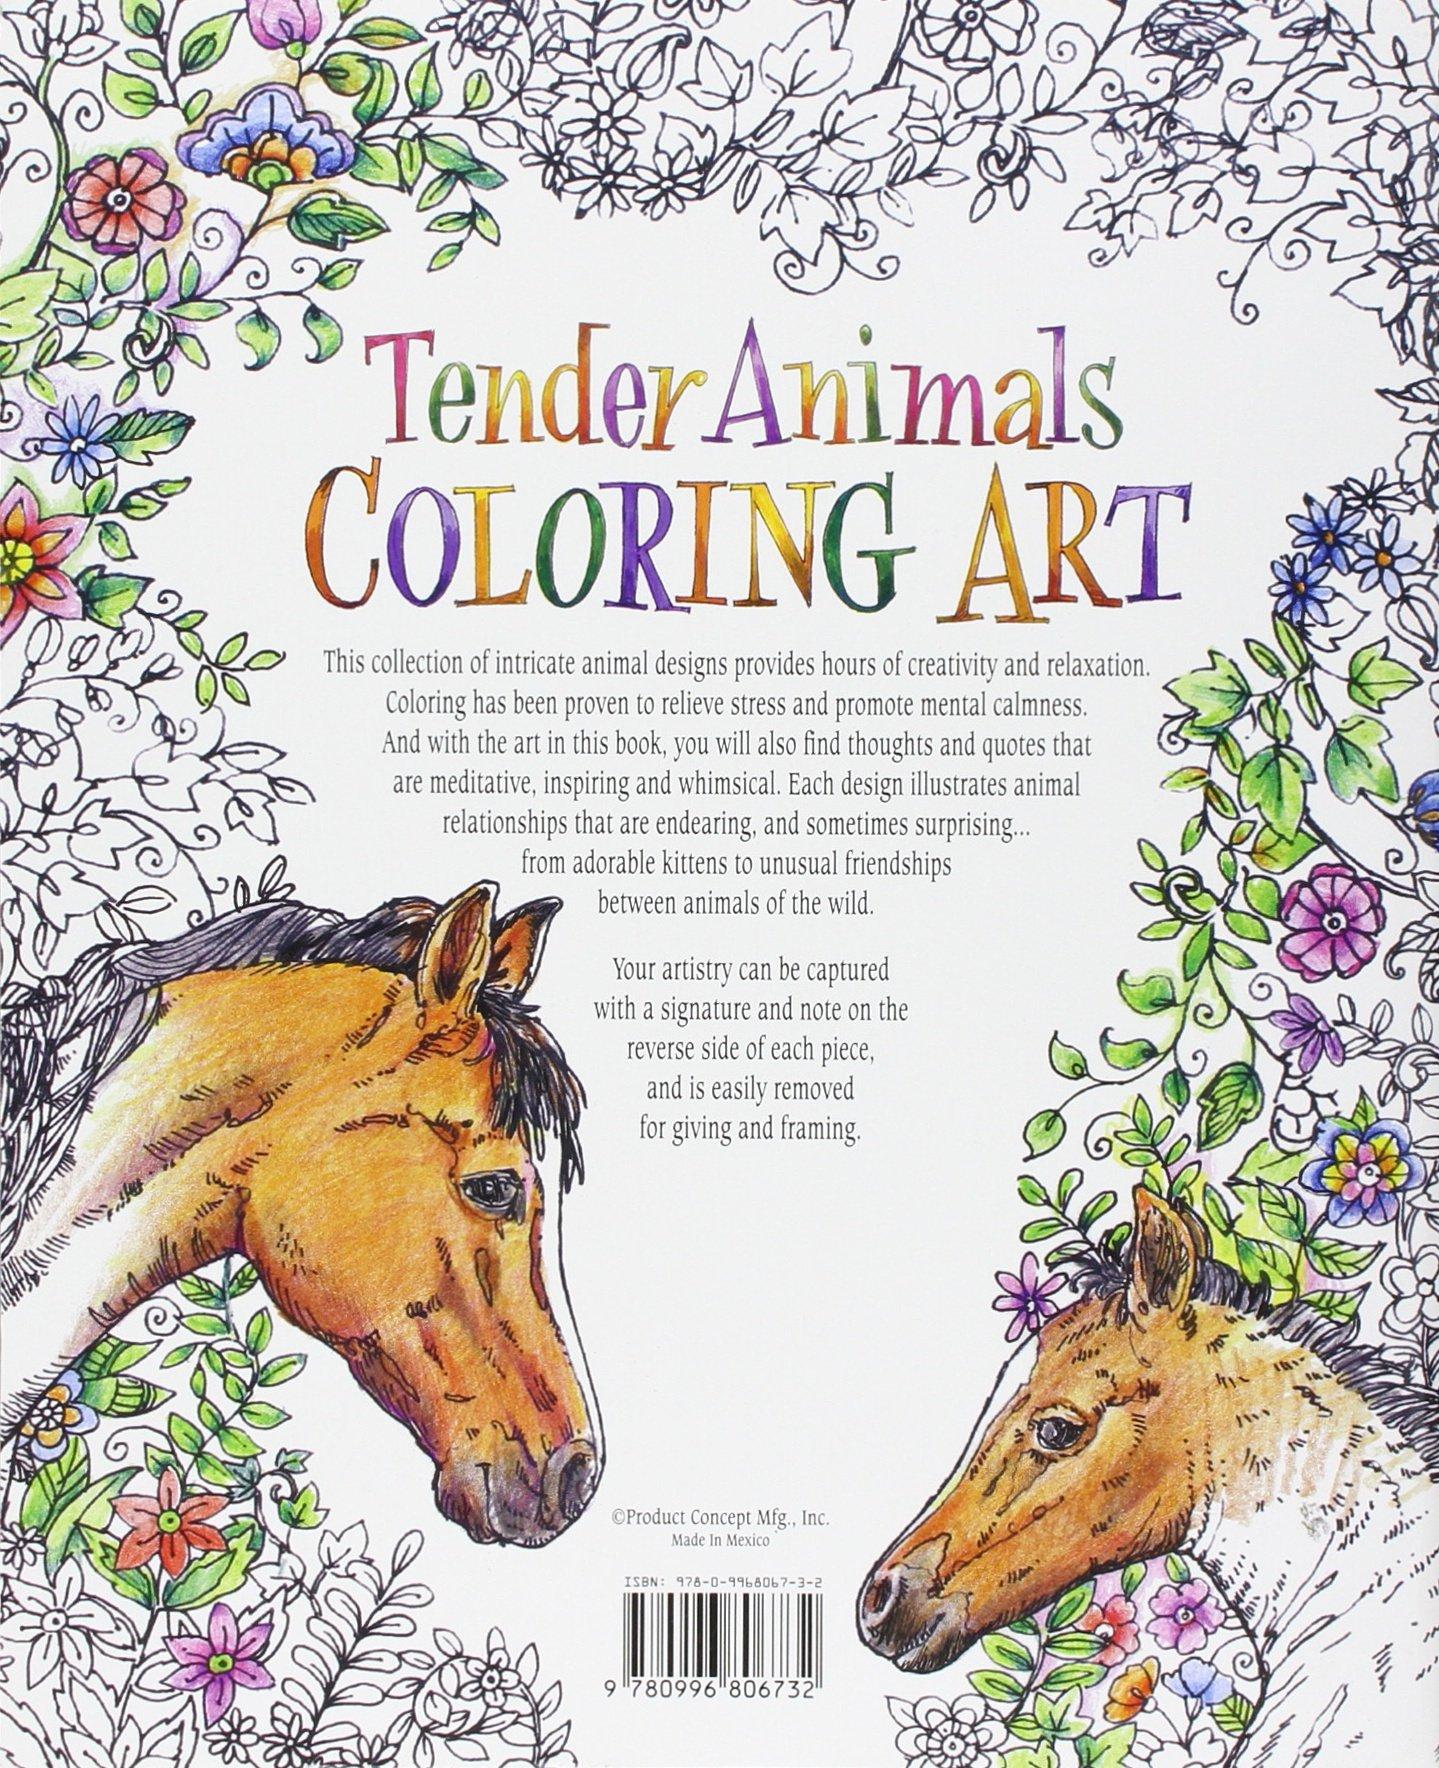 Amazon Tender Animals Coloring Art 9780996806732 Inc Product Concept Mfg Books